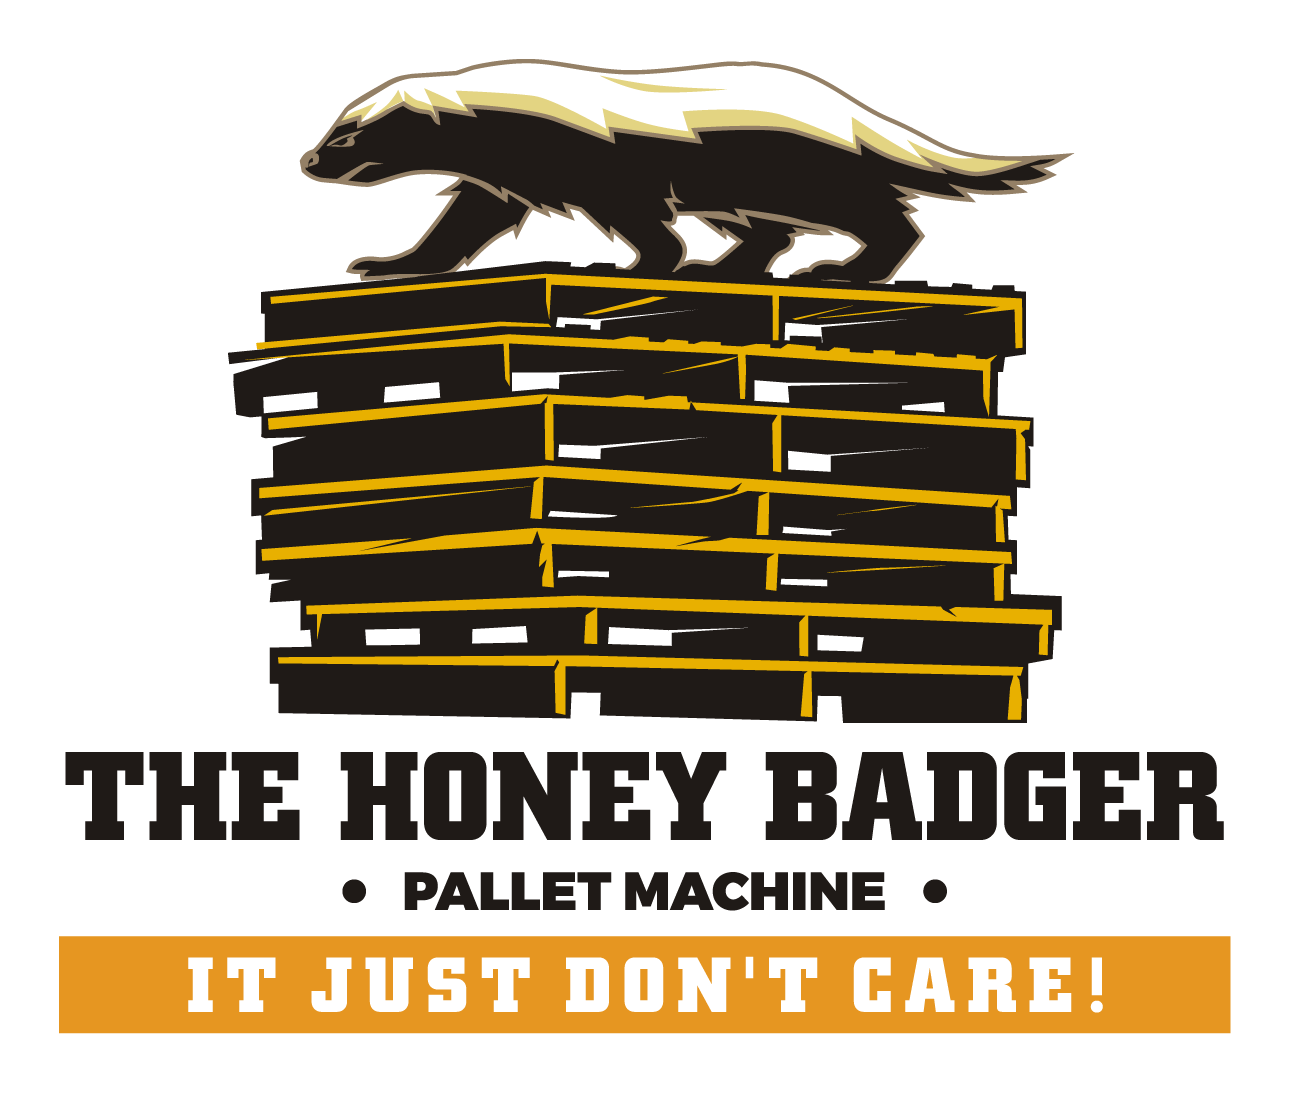 Honey Badger Recycled Pallet Nailing Machine